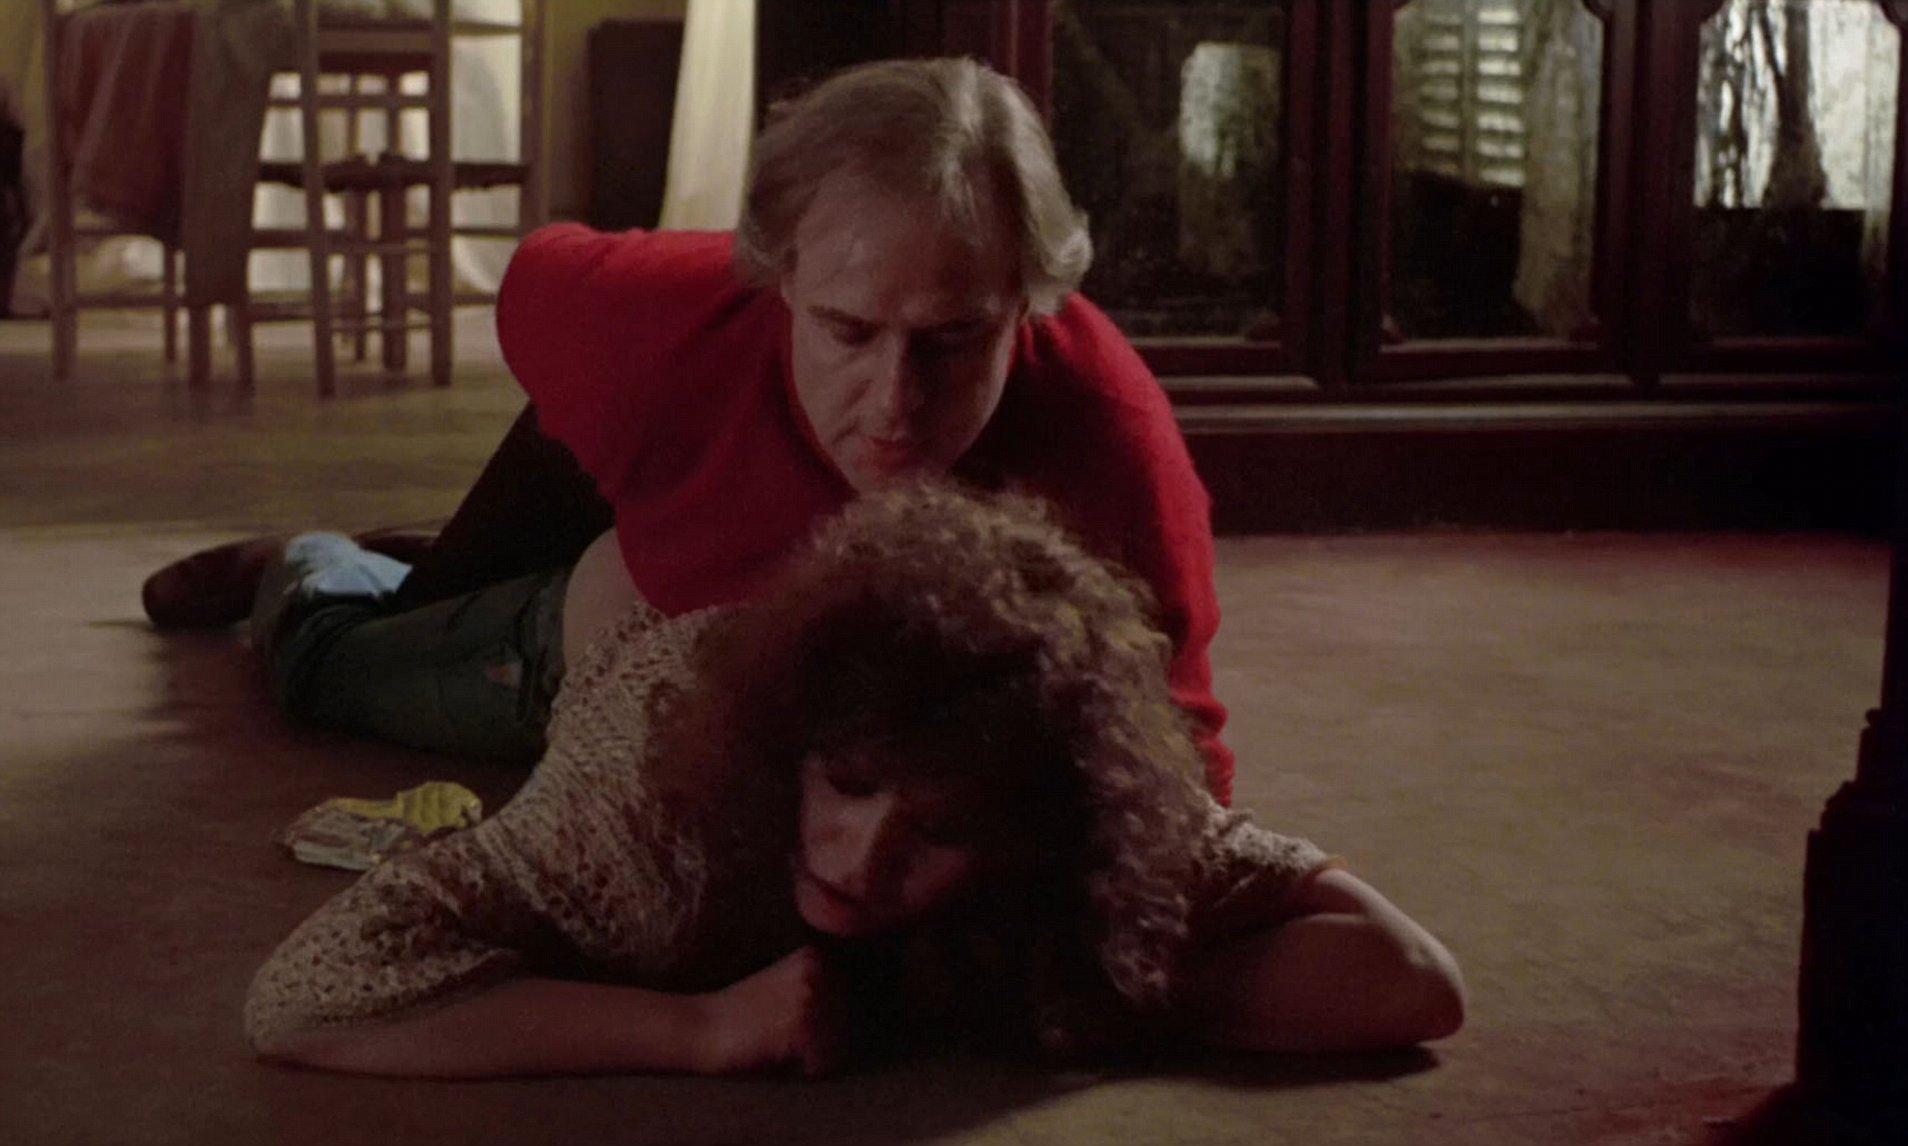 Top last tango in paris nude scenes, sexiest pics clips